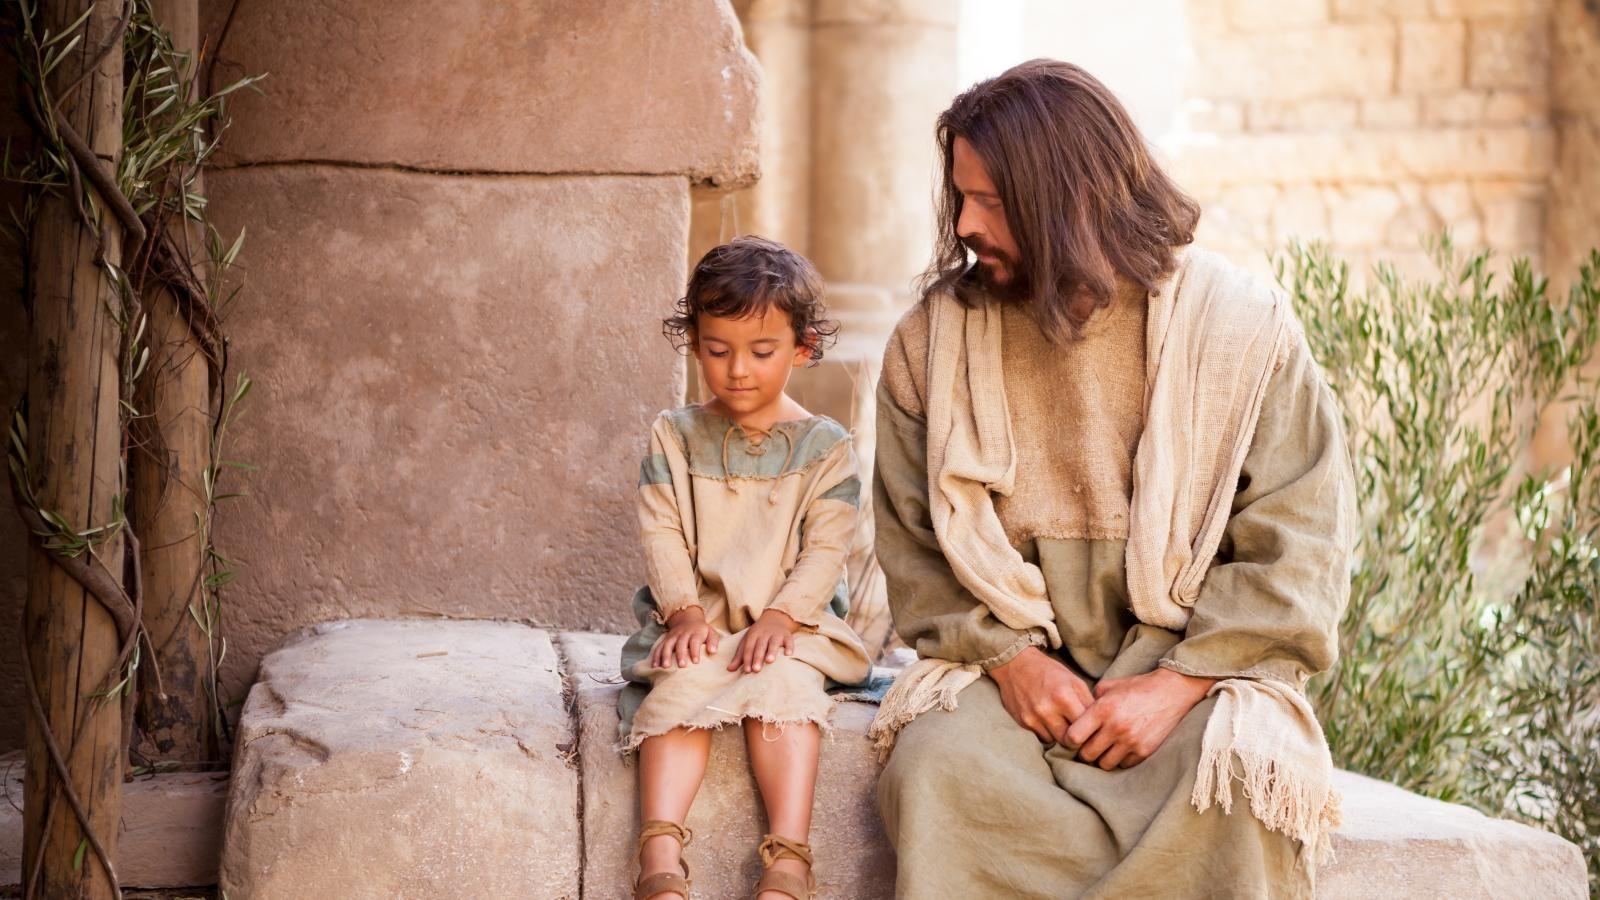 The life of jesus christ essay